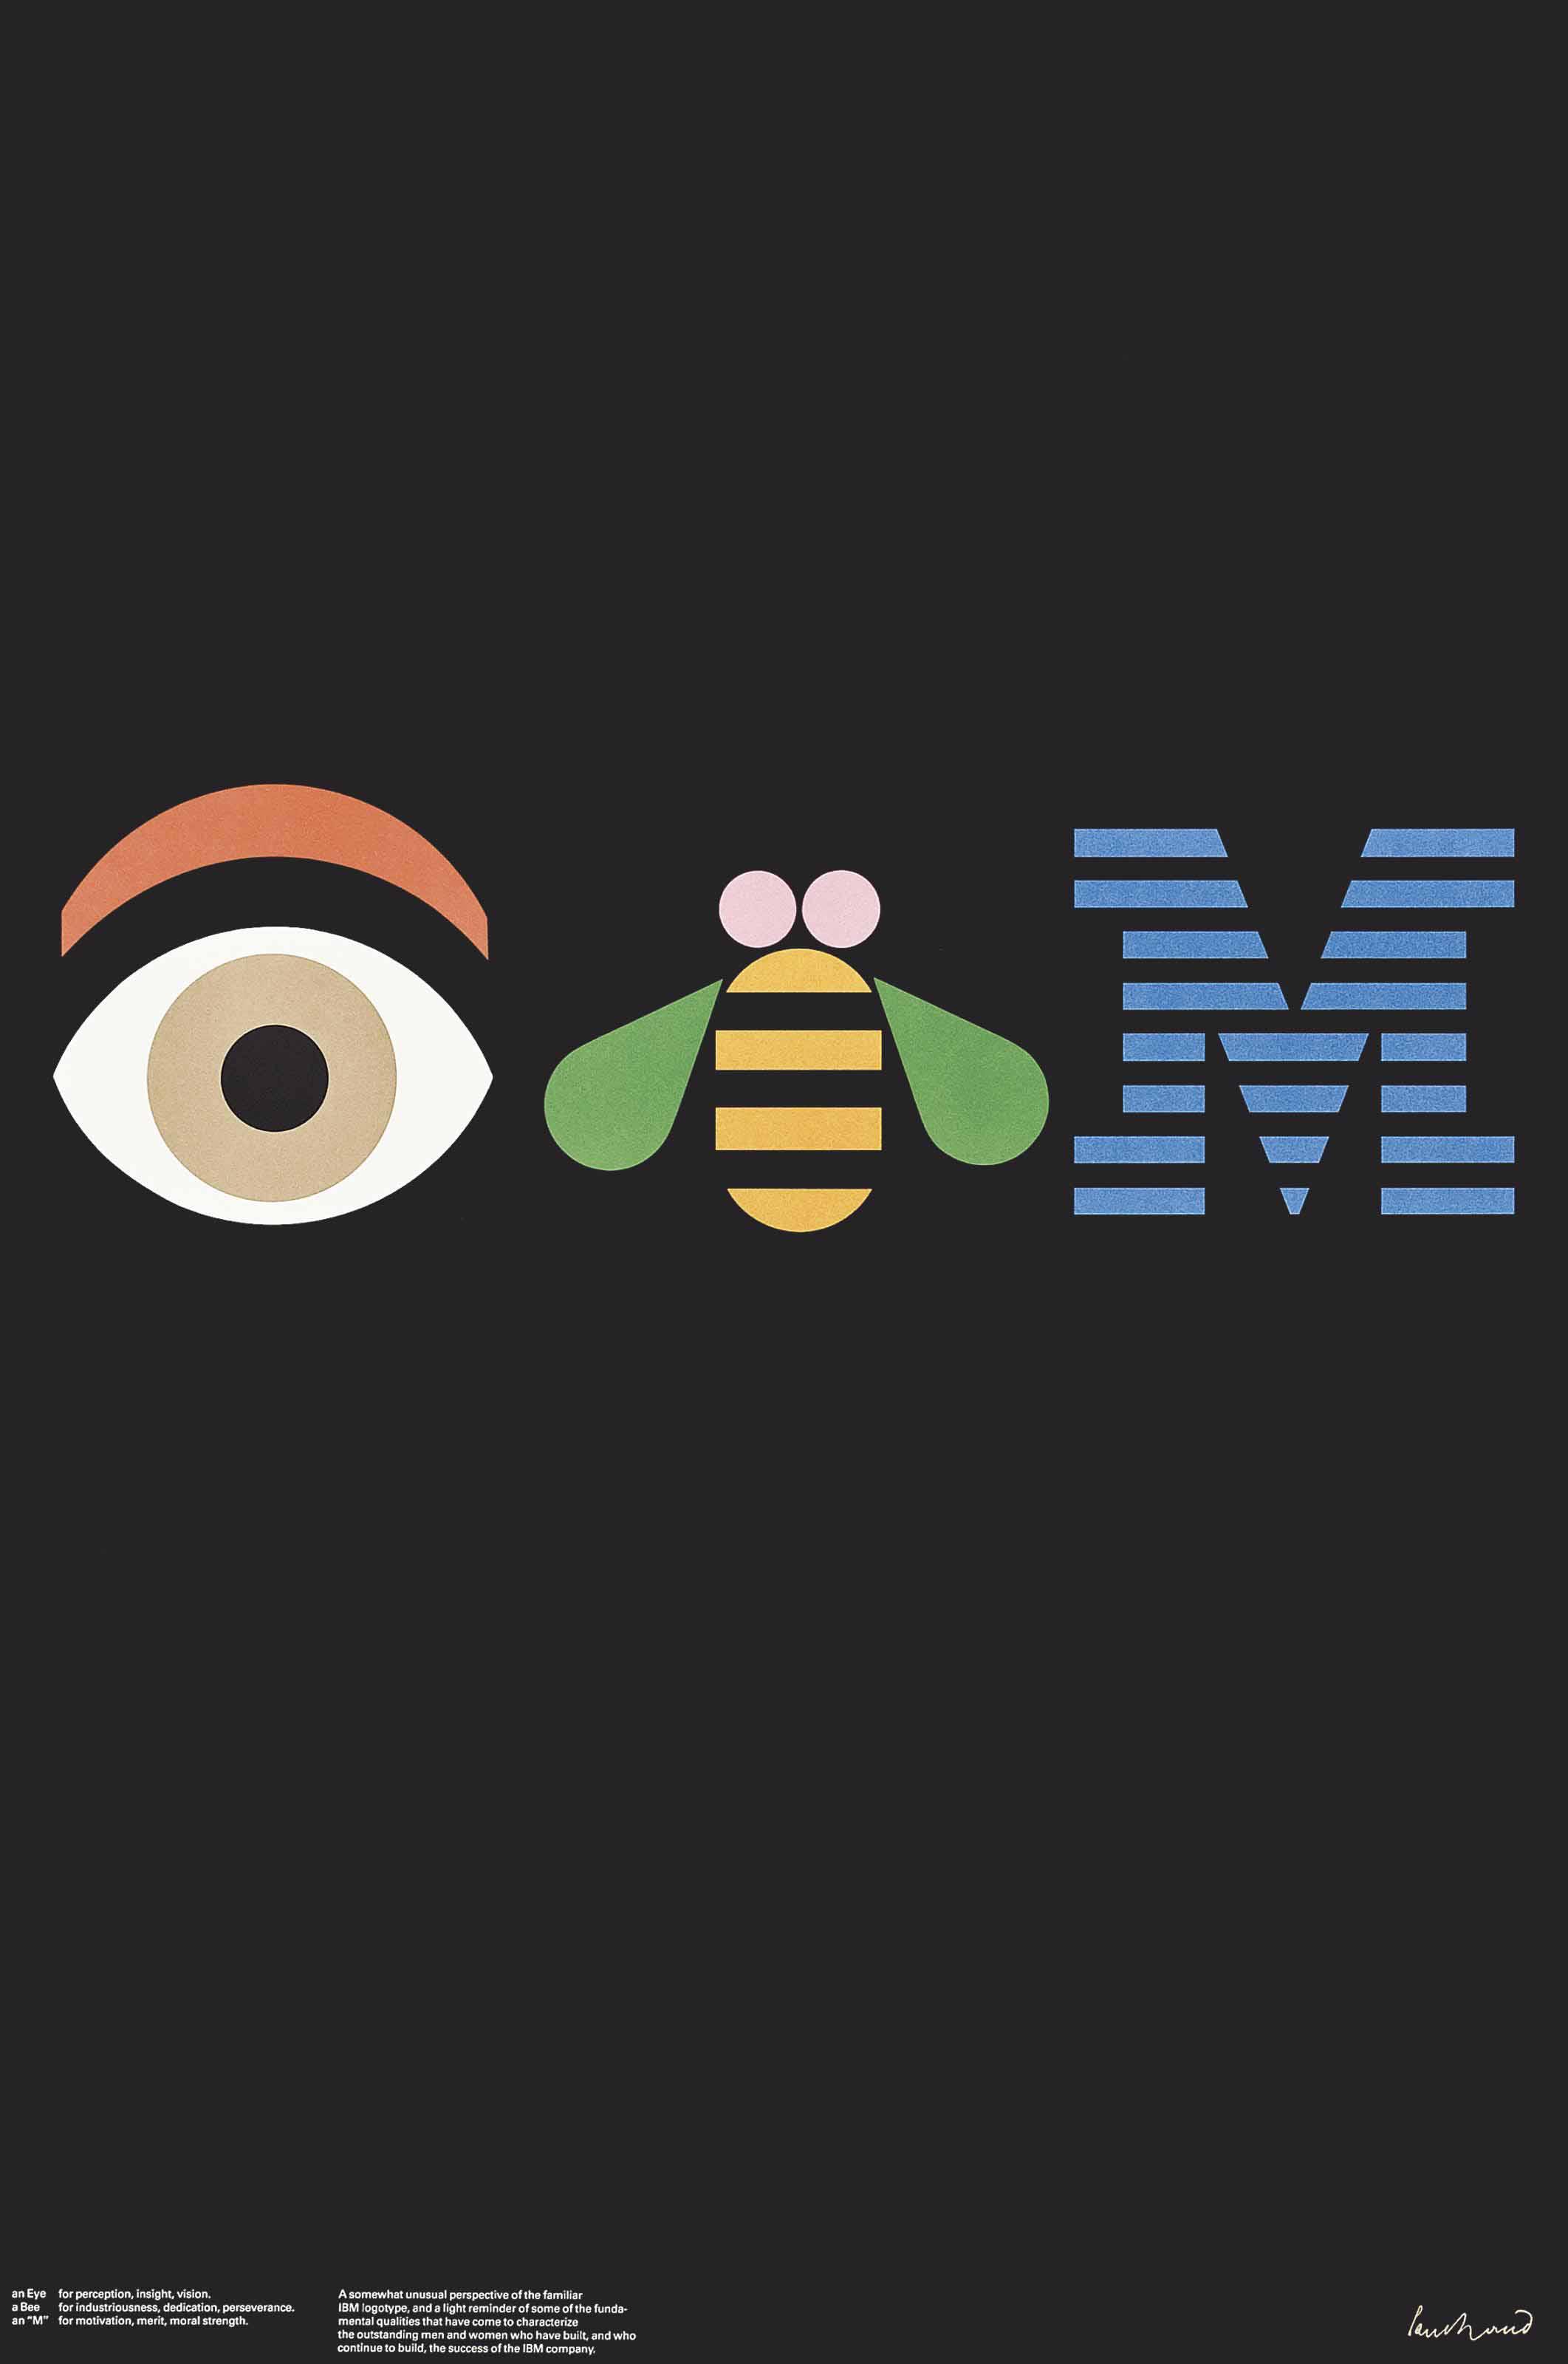 Lot 174 Paul Rand 1914 1996 IBM